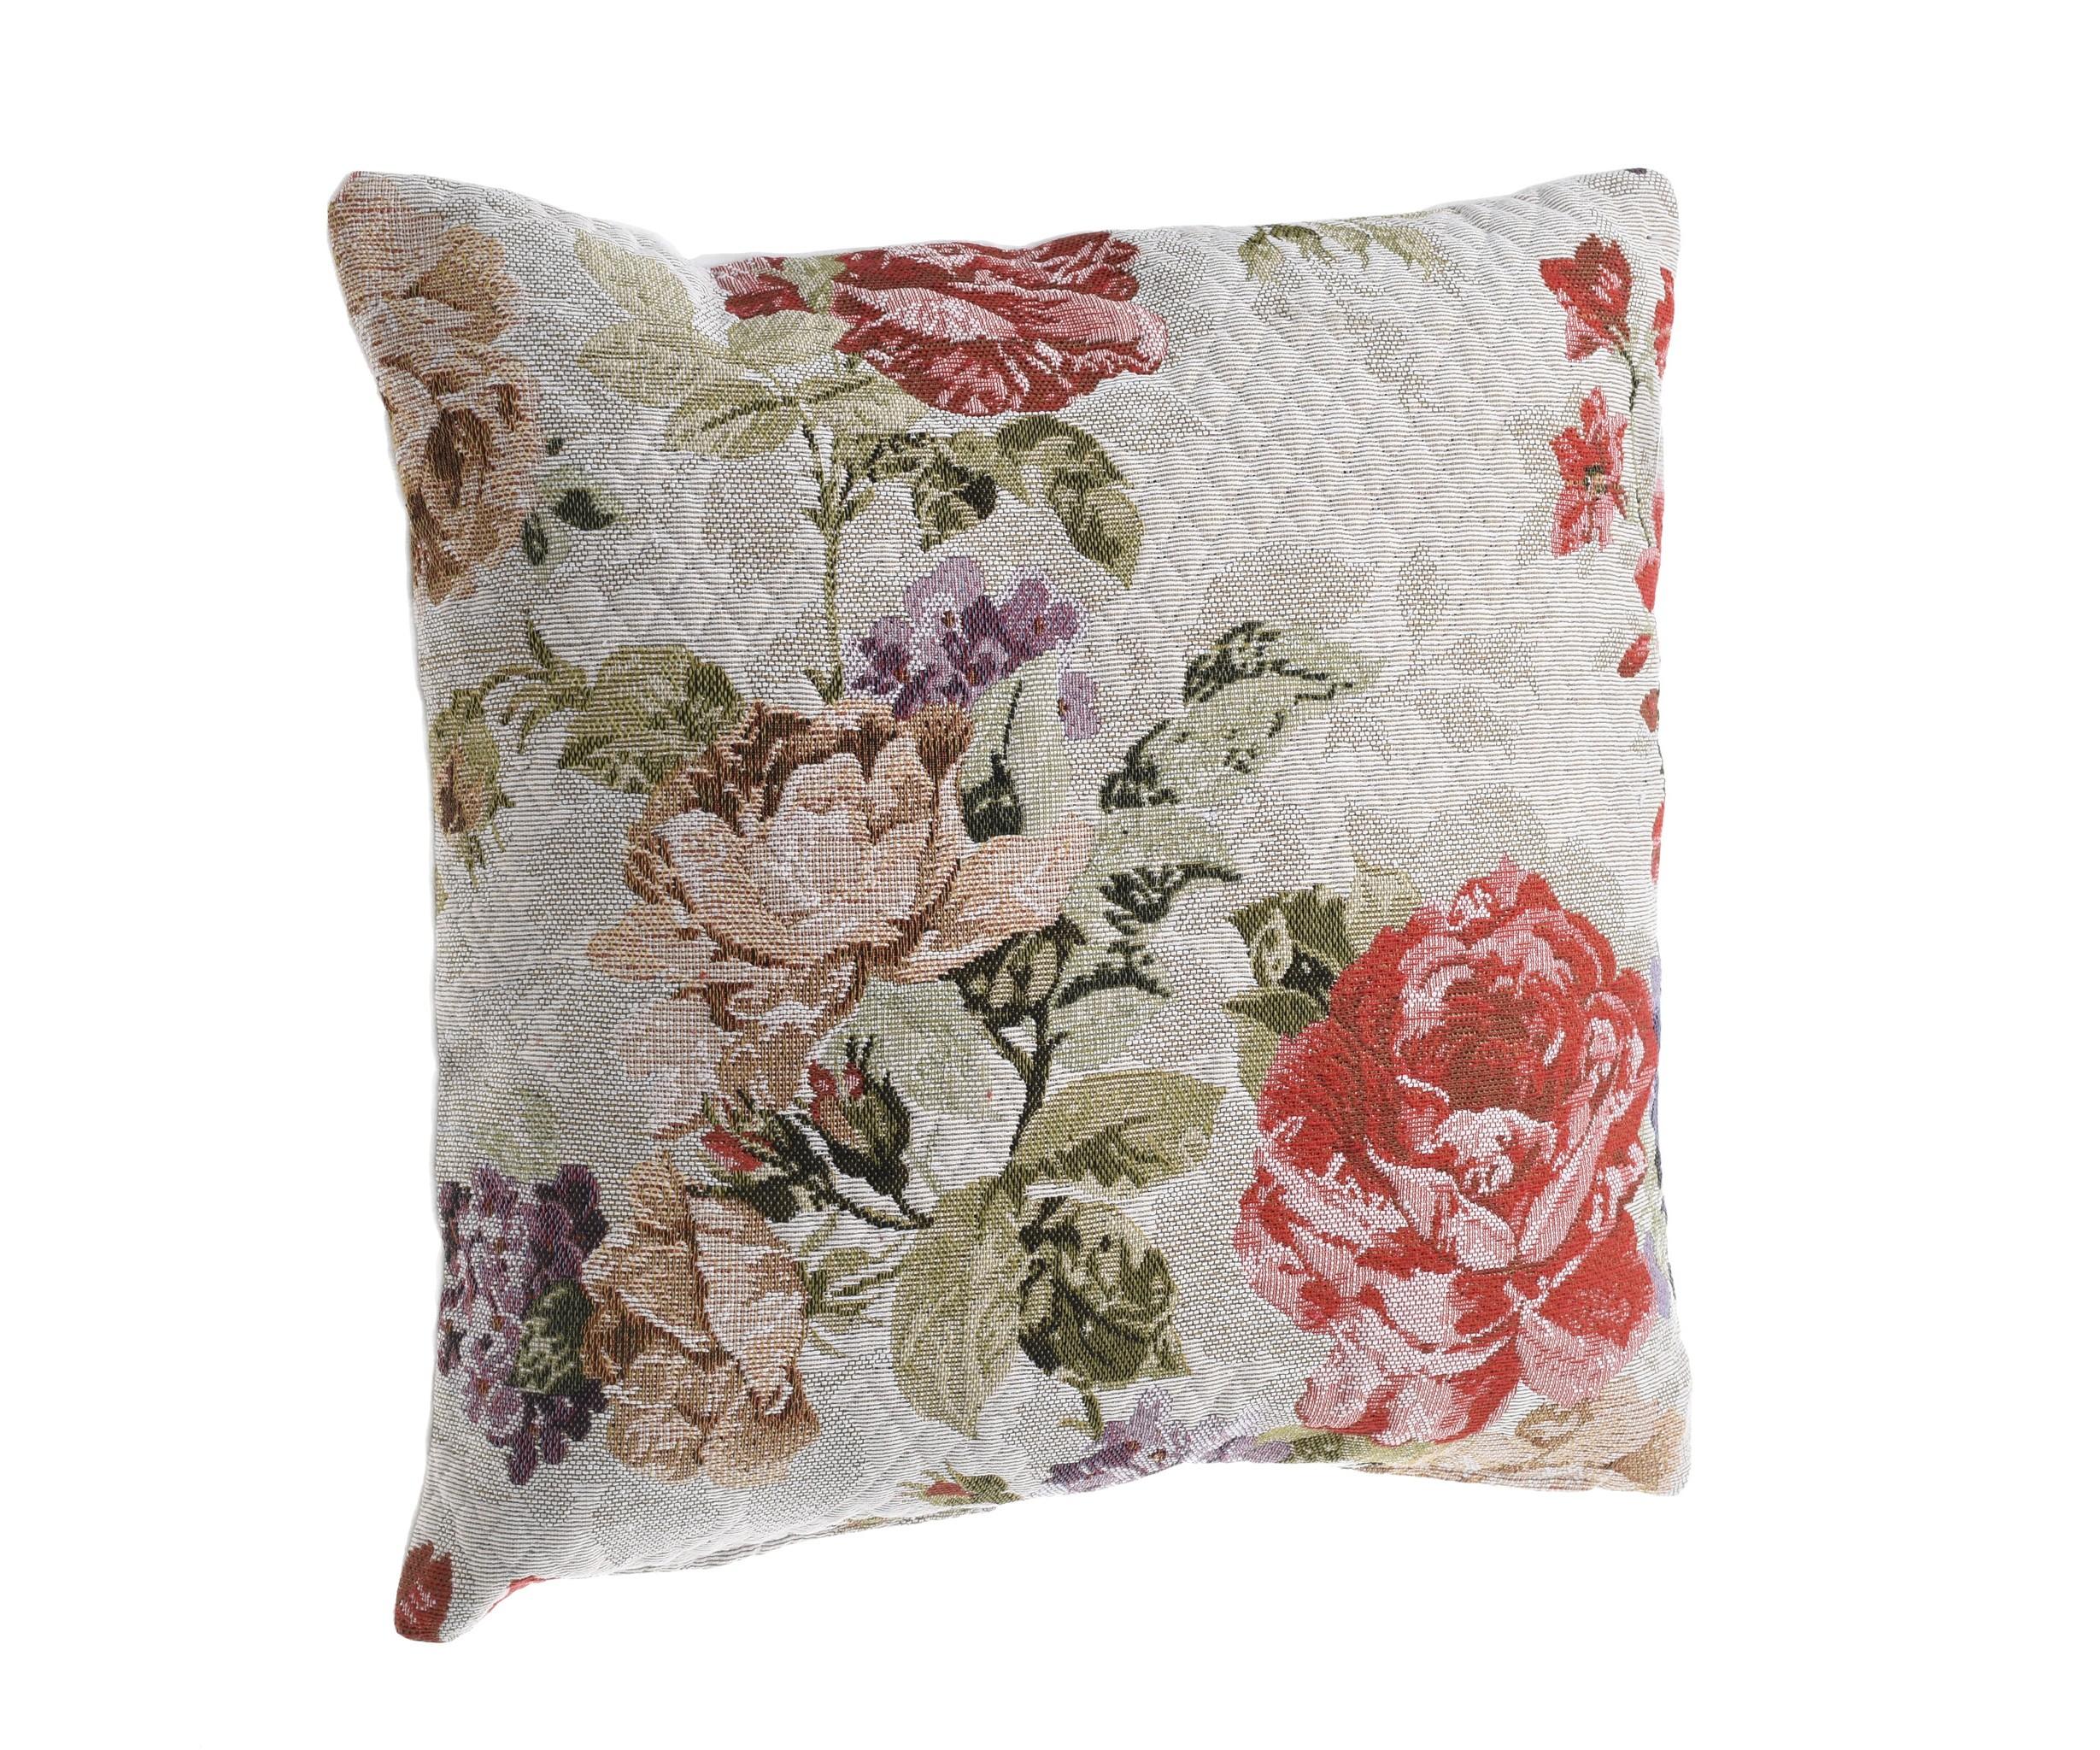 Подушка OlinКвадратные подушки и наволочки<br><br><br>Material: Текстиль